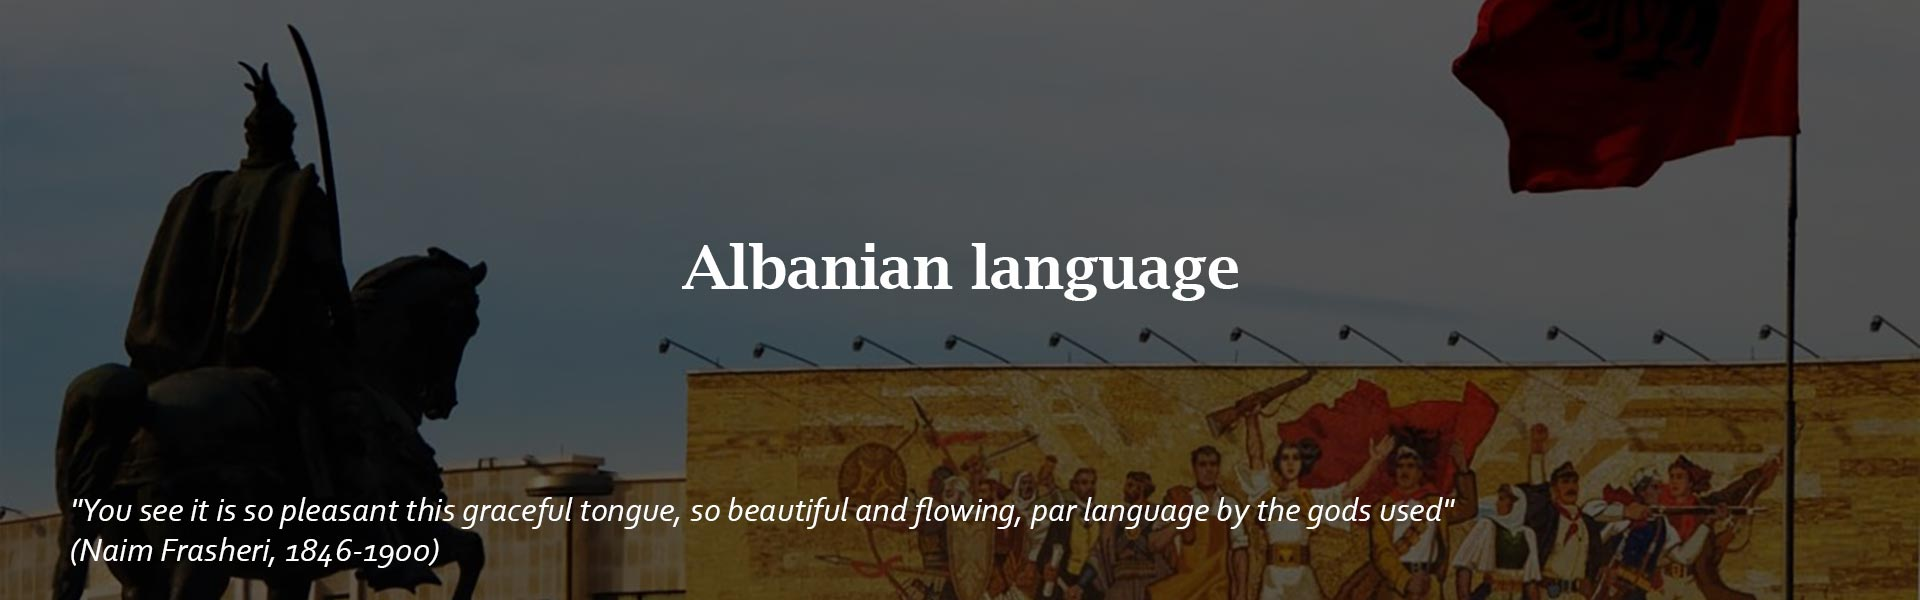 Albanian-language-Alif